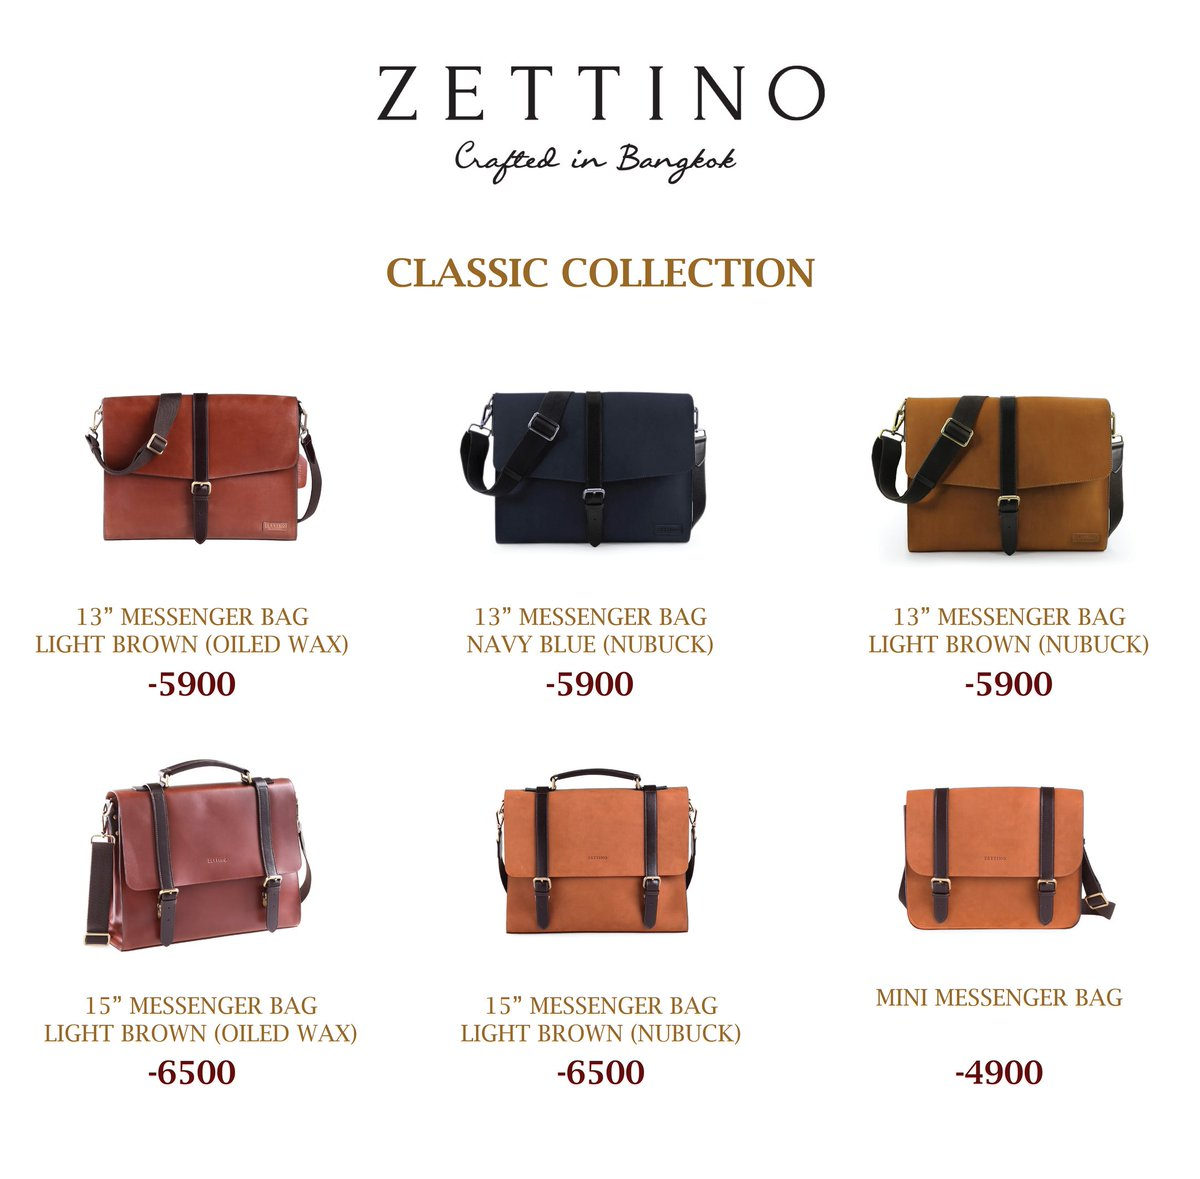 8d15a1fc16f44  zettino  classics  classsicseries  series  กระเป๋า  bag  กระเป๋าแฟชั่น   minimal  ทีมจุฬาpic.twitter.com MTFu3WwhDp